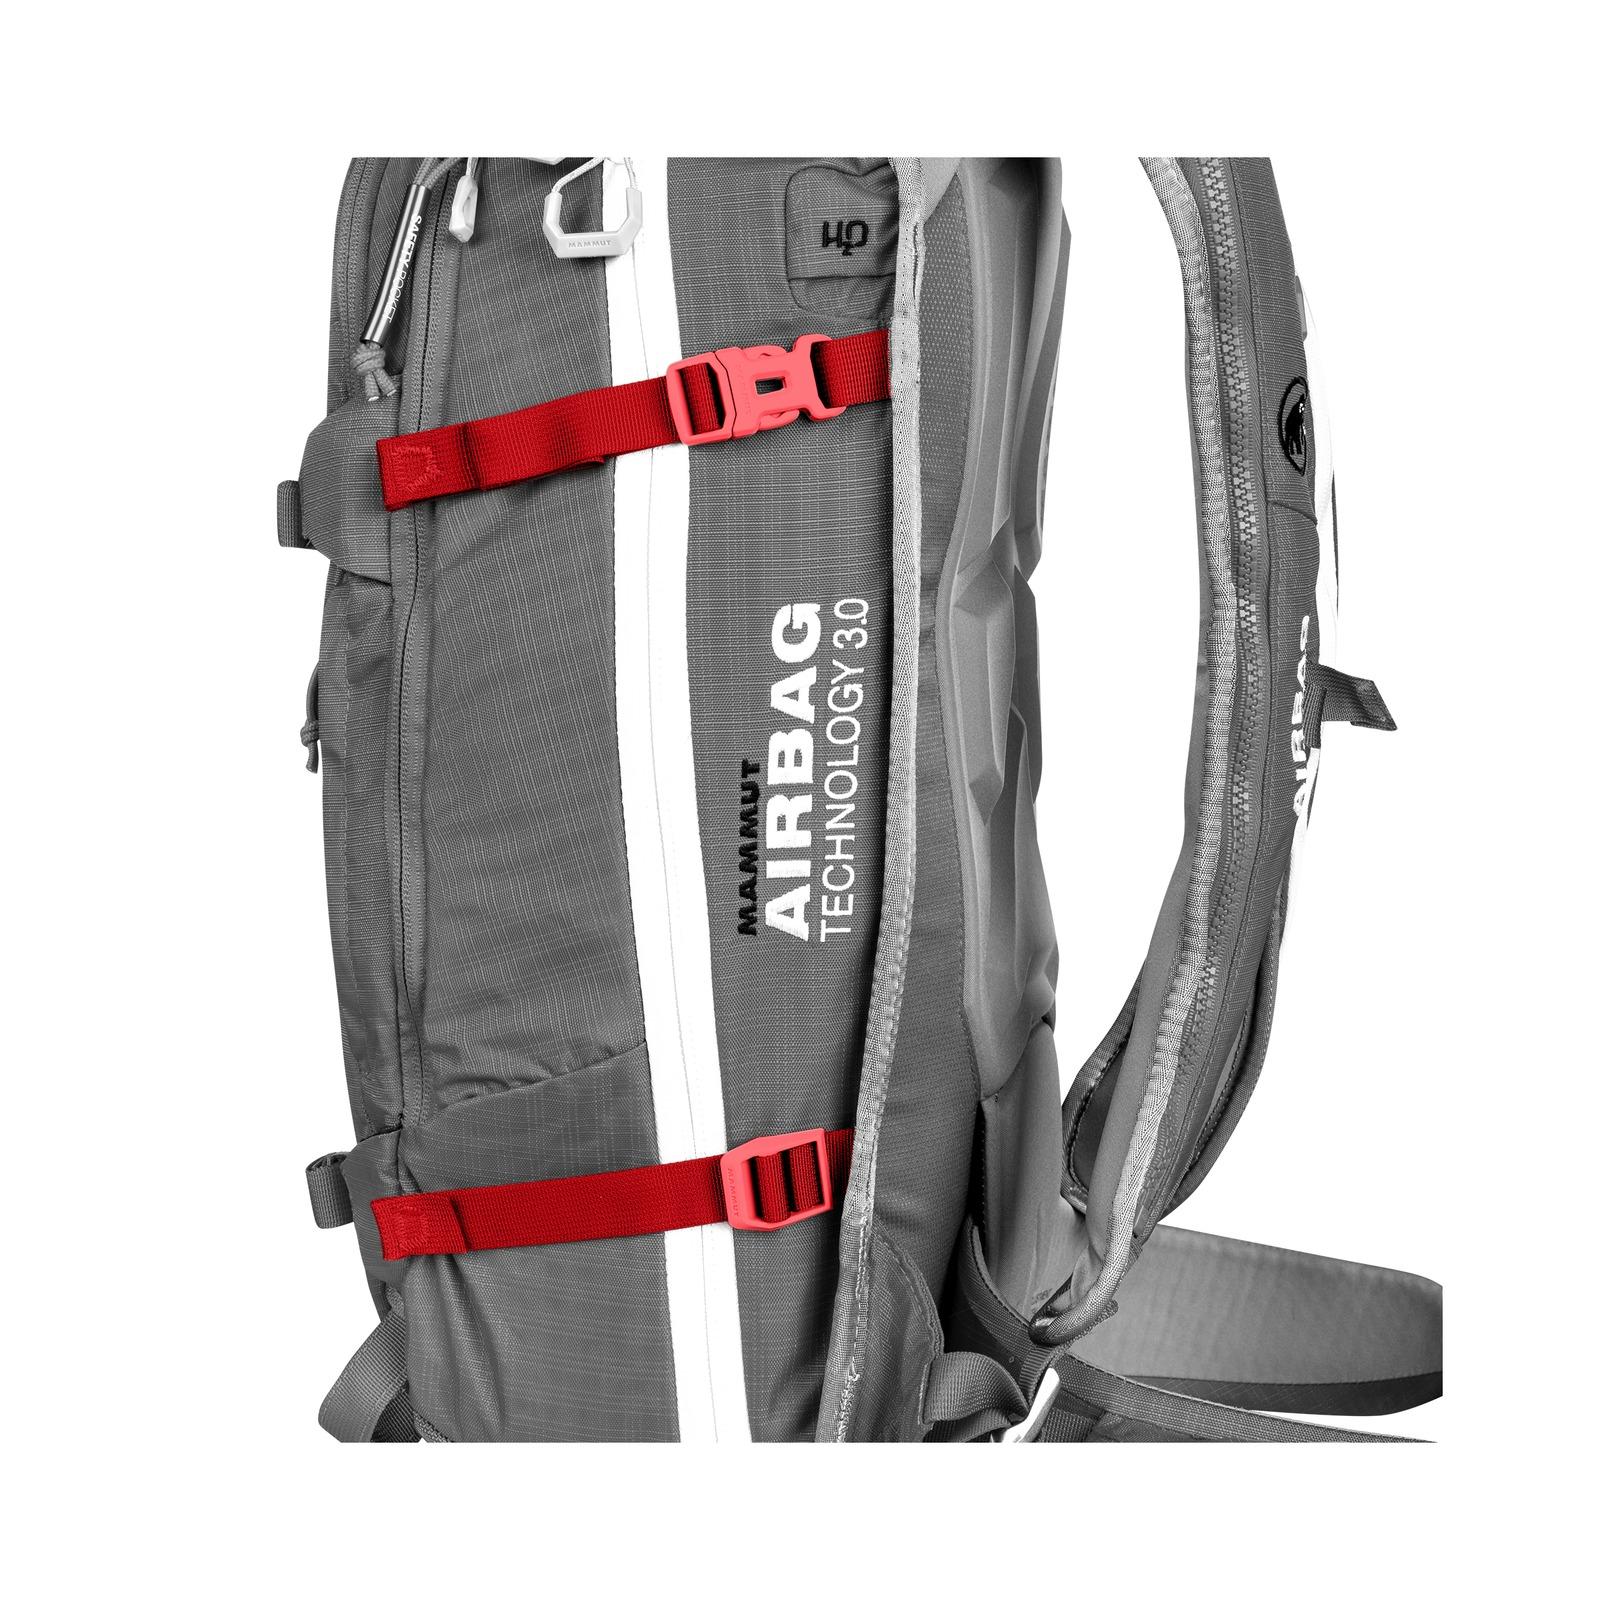 ride-protection-airbag-3-0-6_neutral_det_rgb_1600x1600.jpg